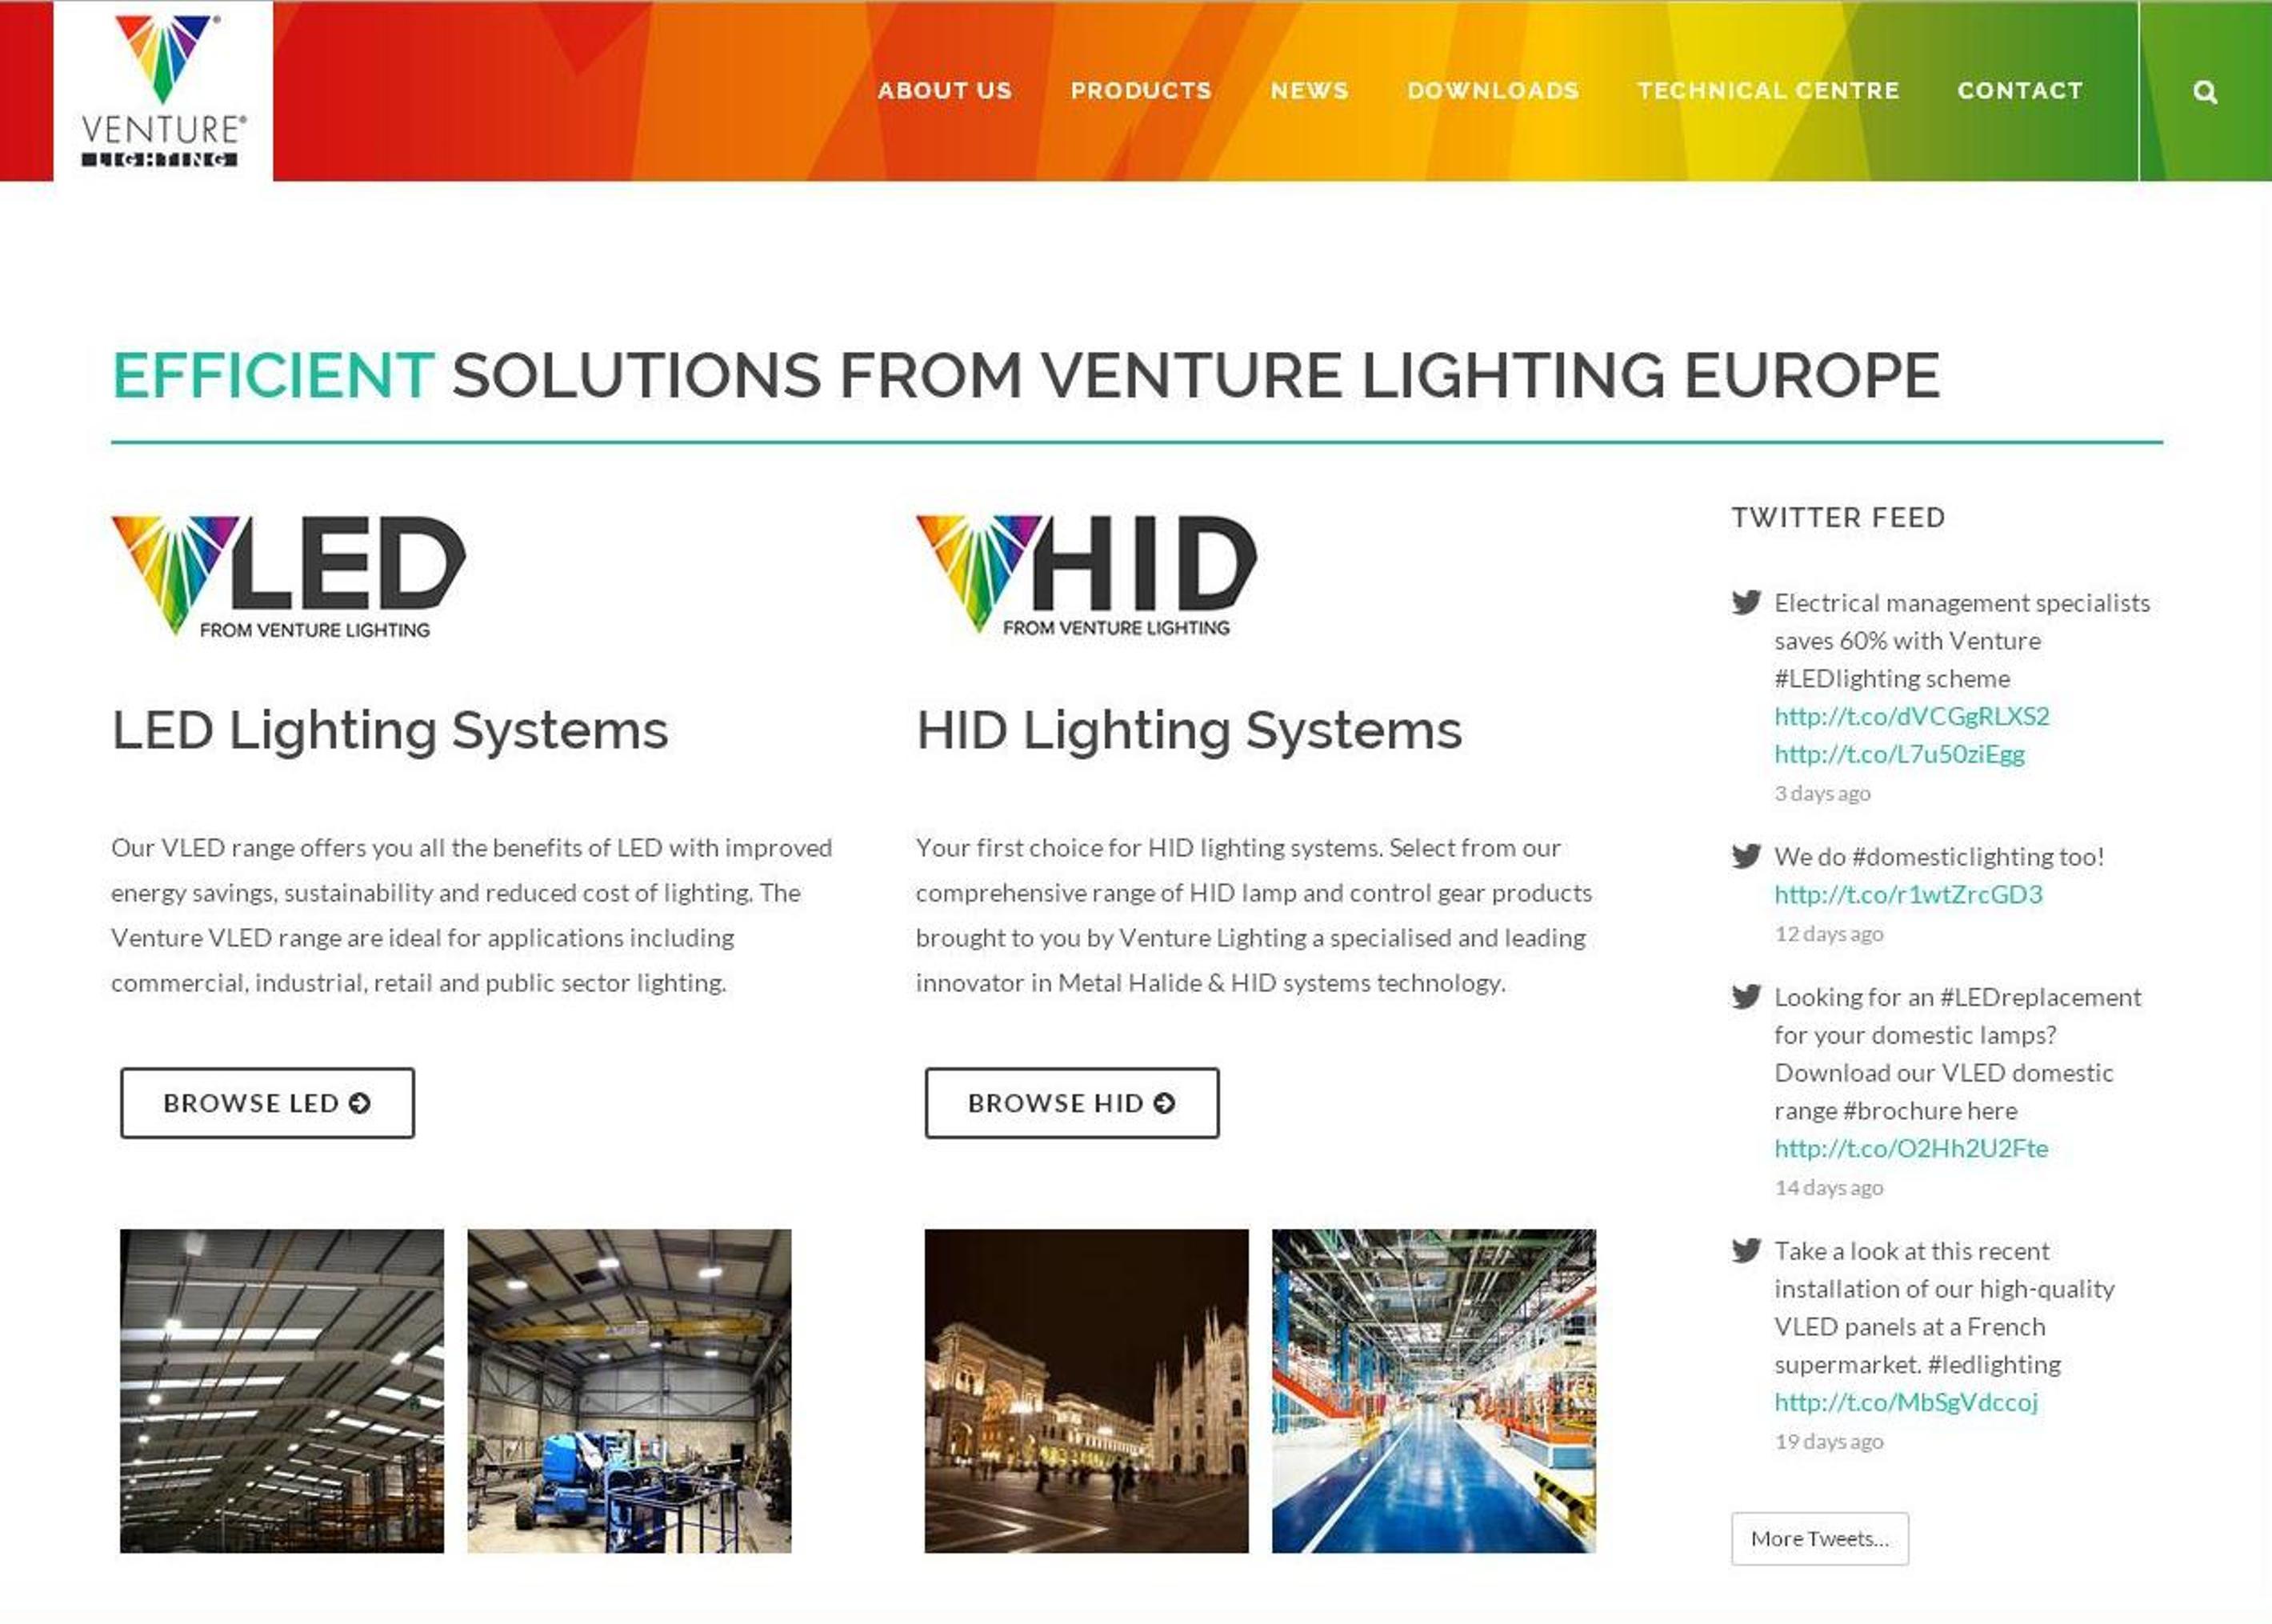 HID Range from Venture Lighting Europe